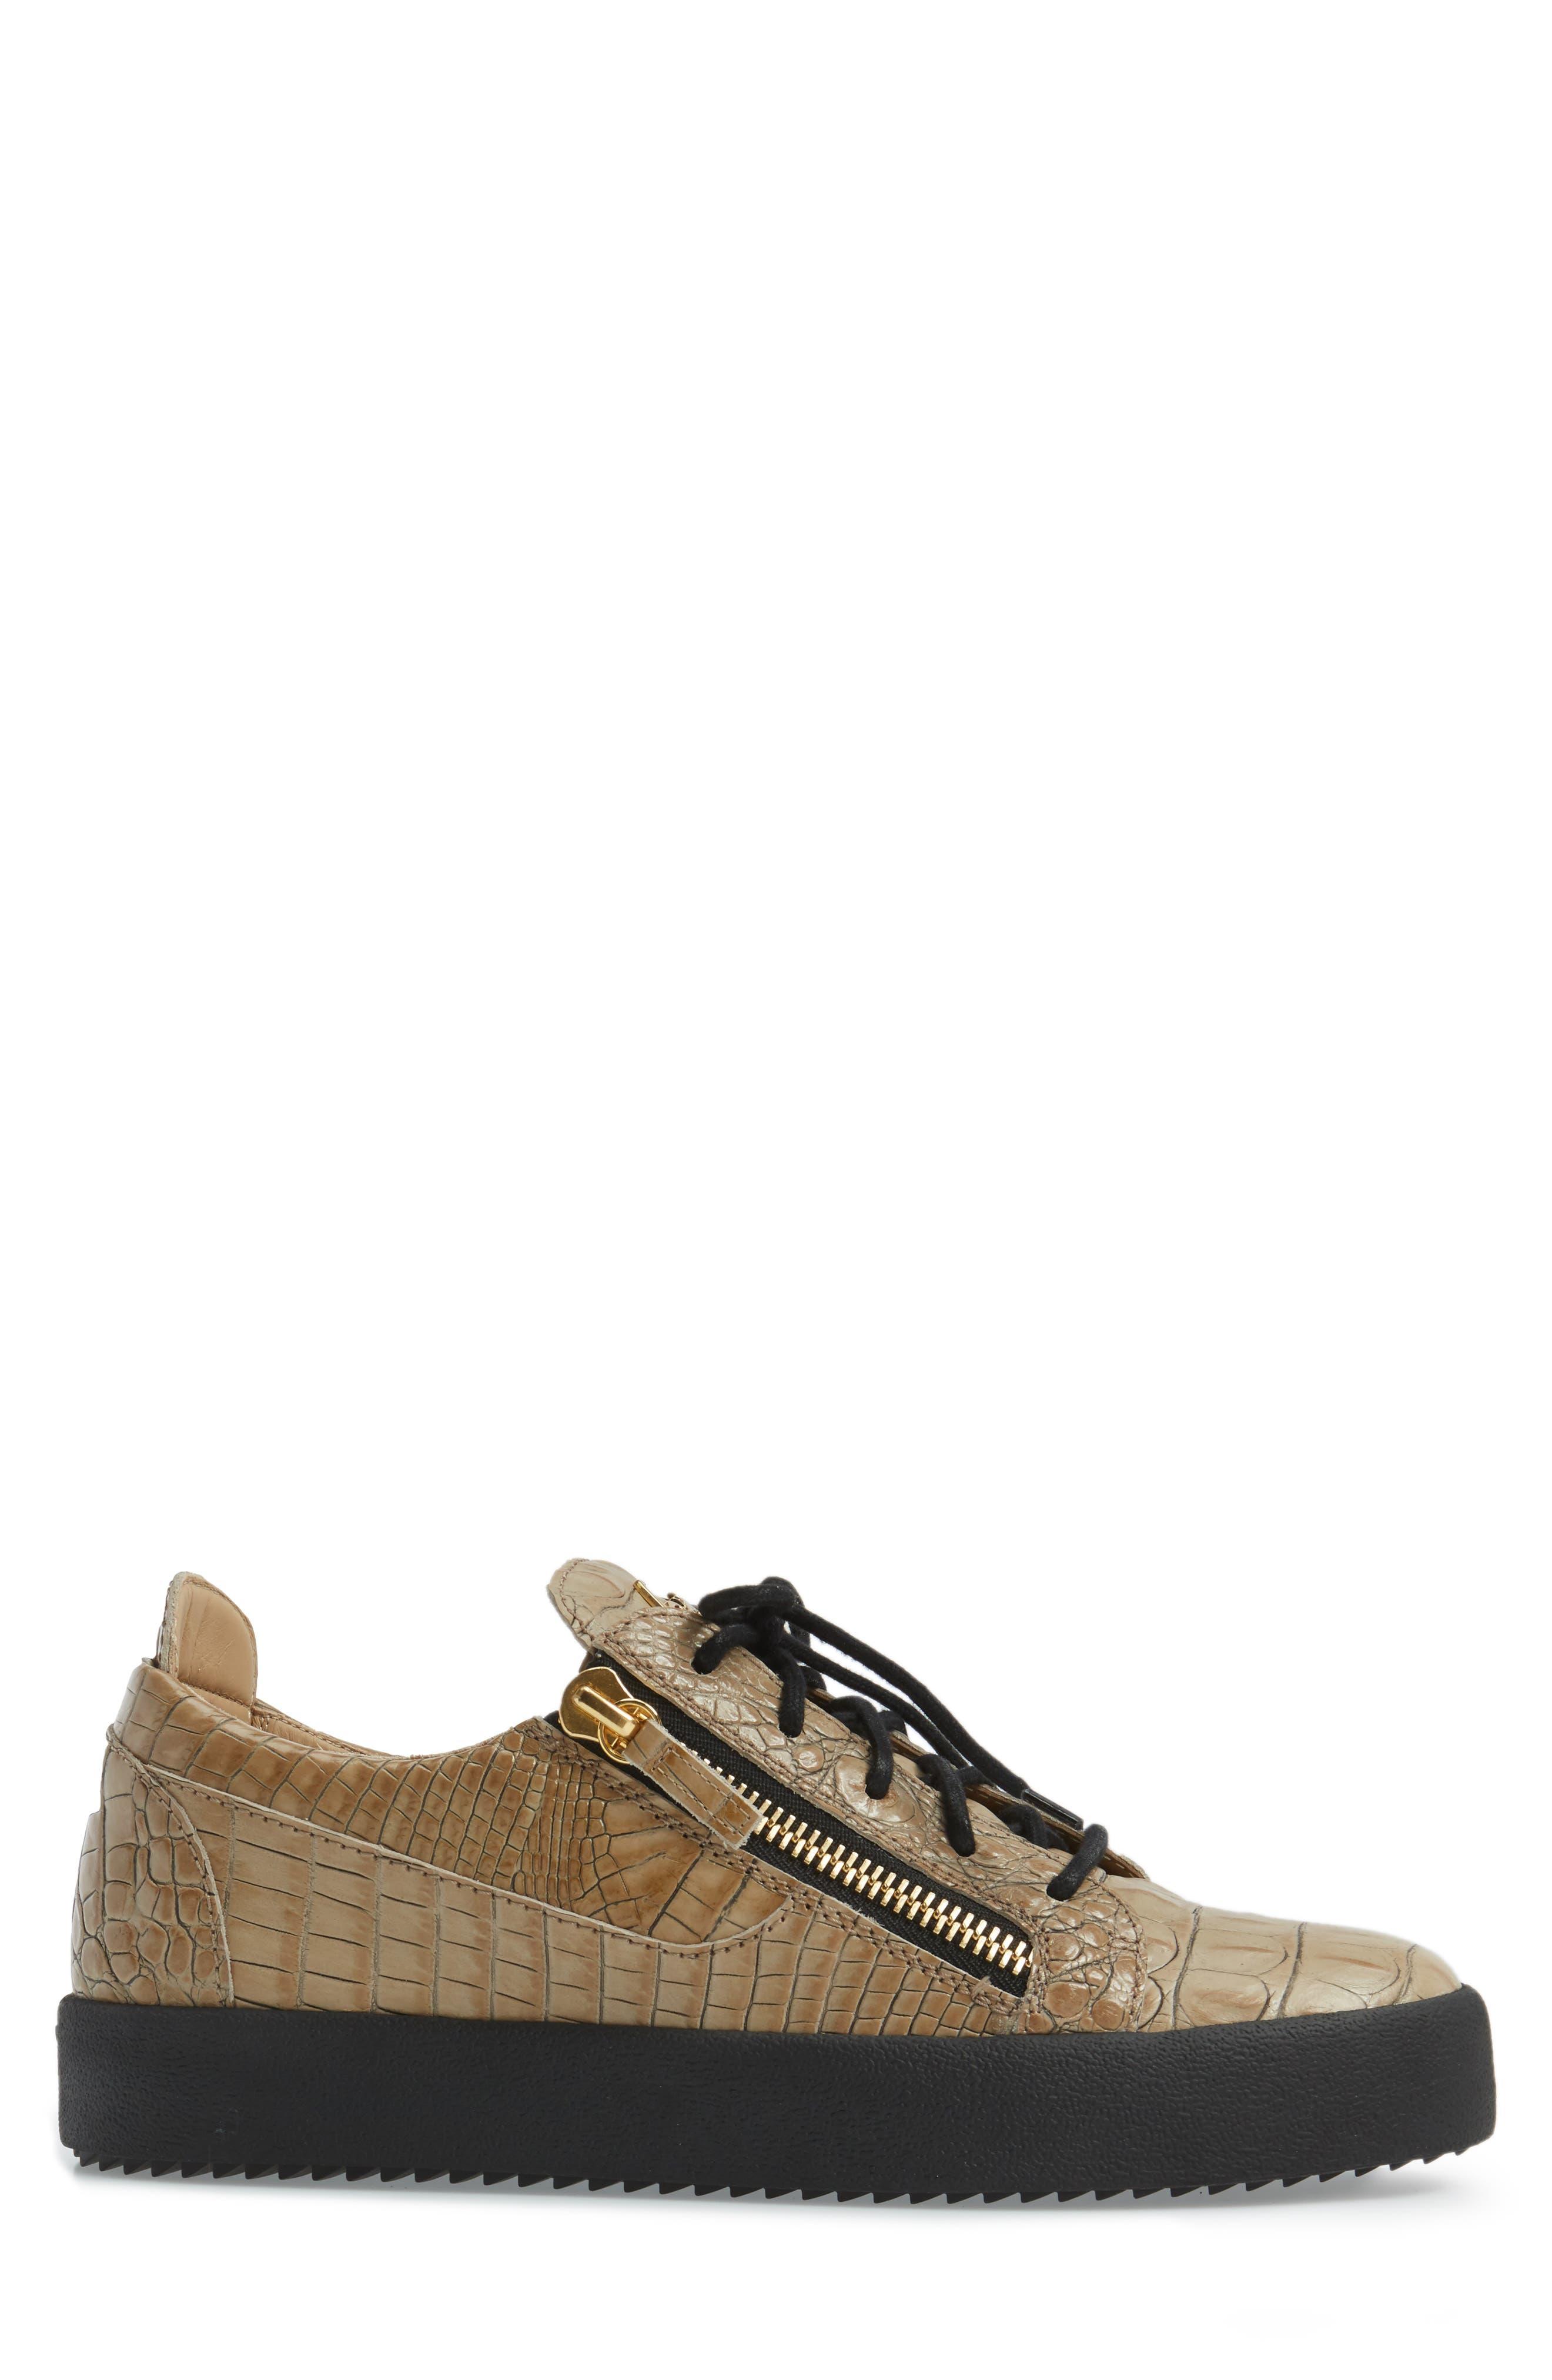 Alternate Image 3  - Giuseppe Zanotti Low Top Sneaker (Men)